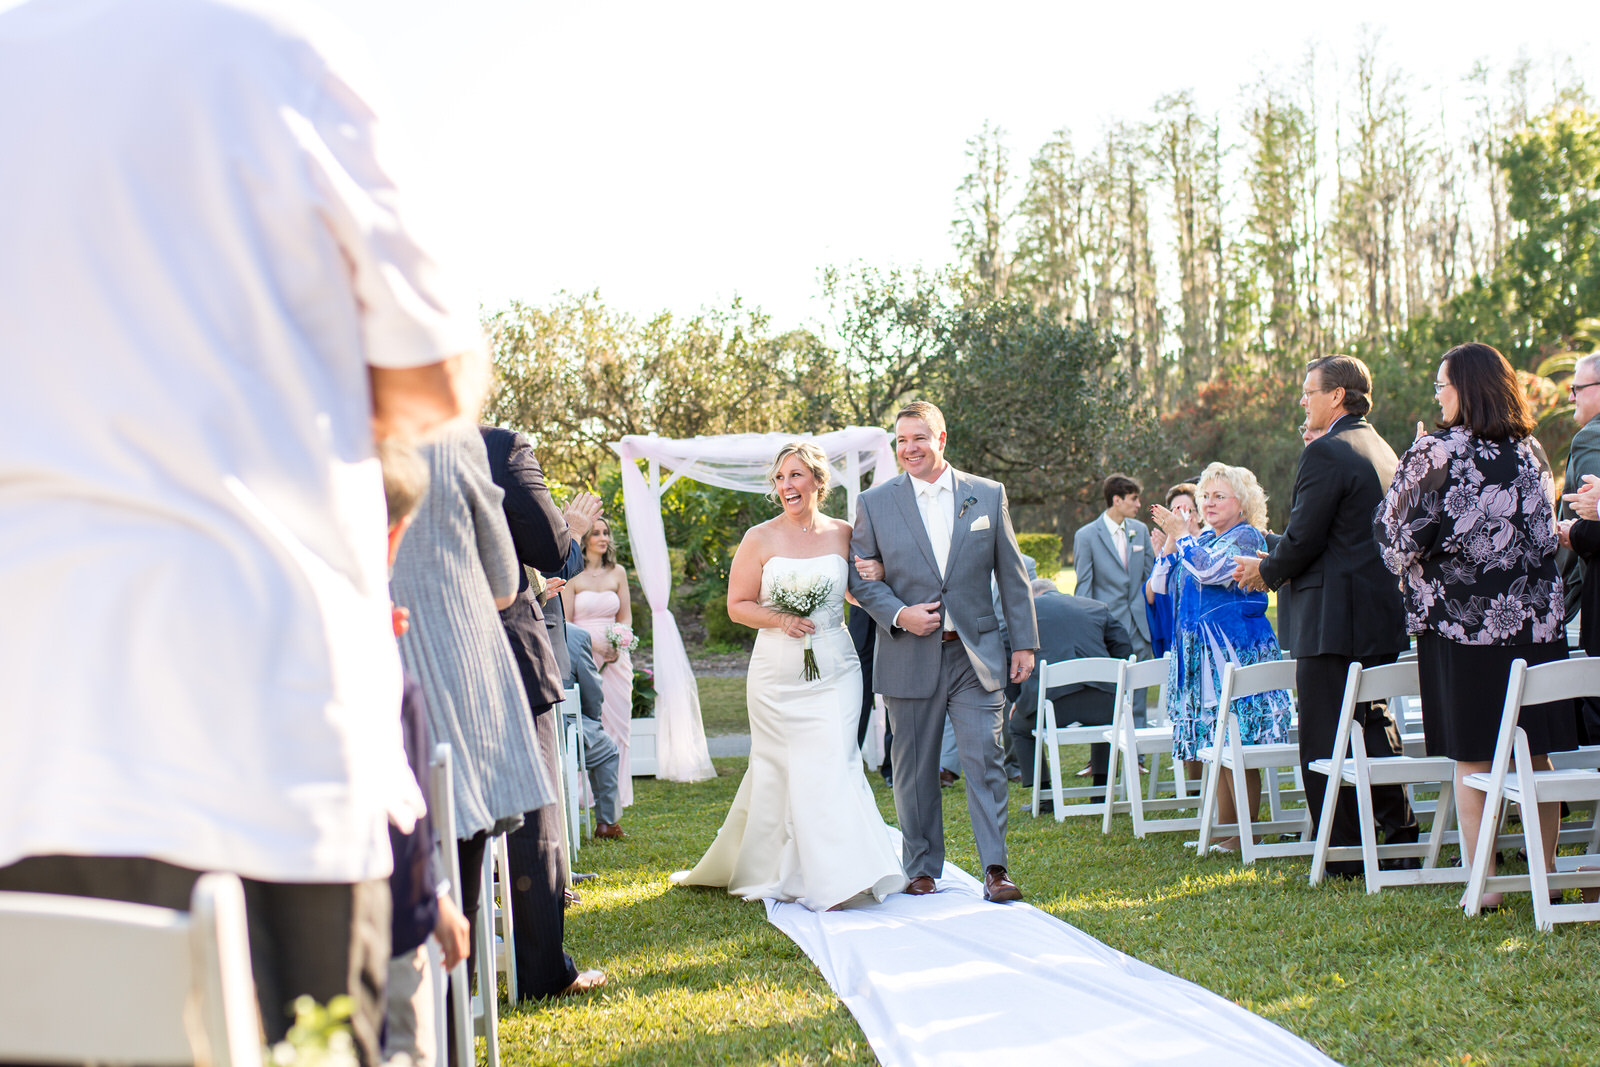 Mike_&_Barbaras_Wedding_3_24_2018-181.jpg